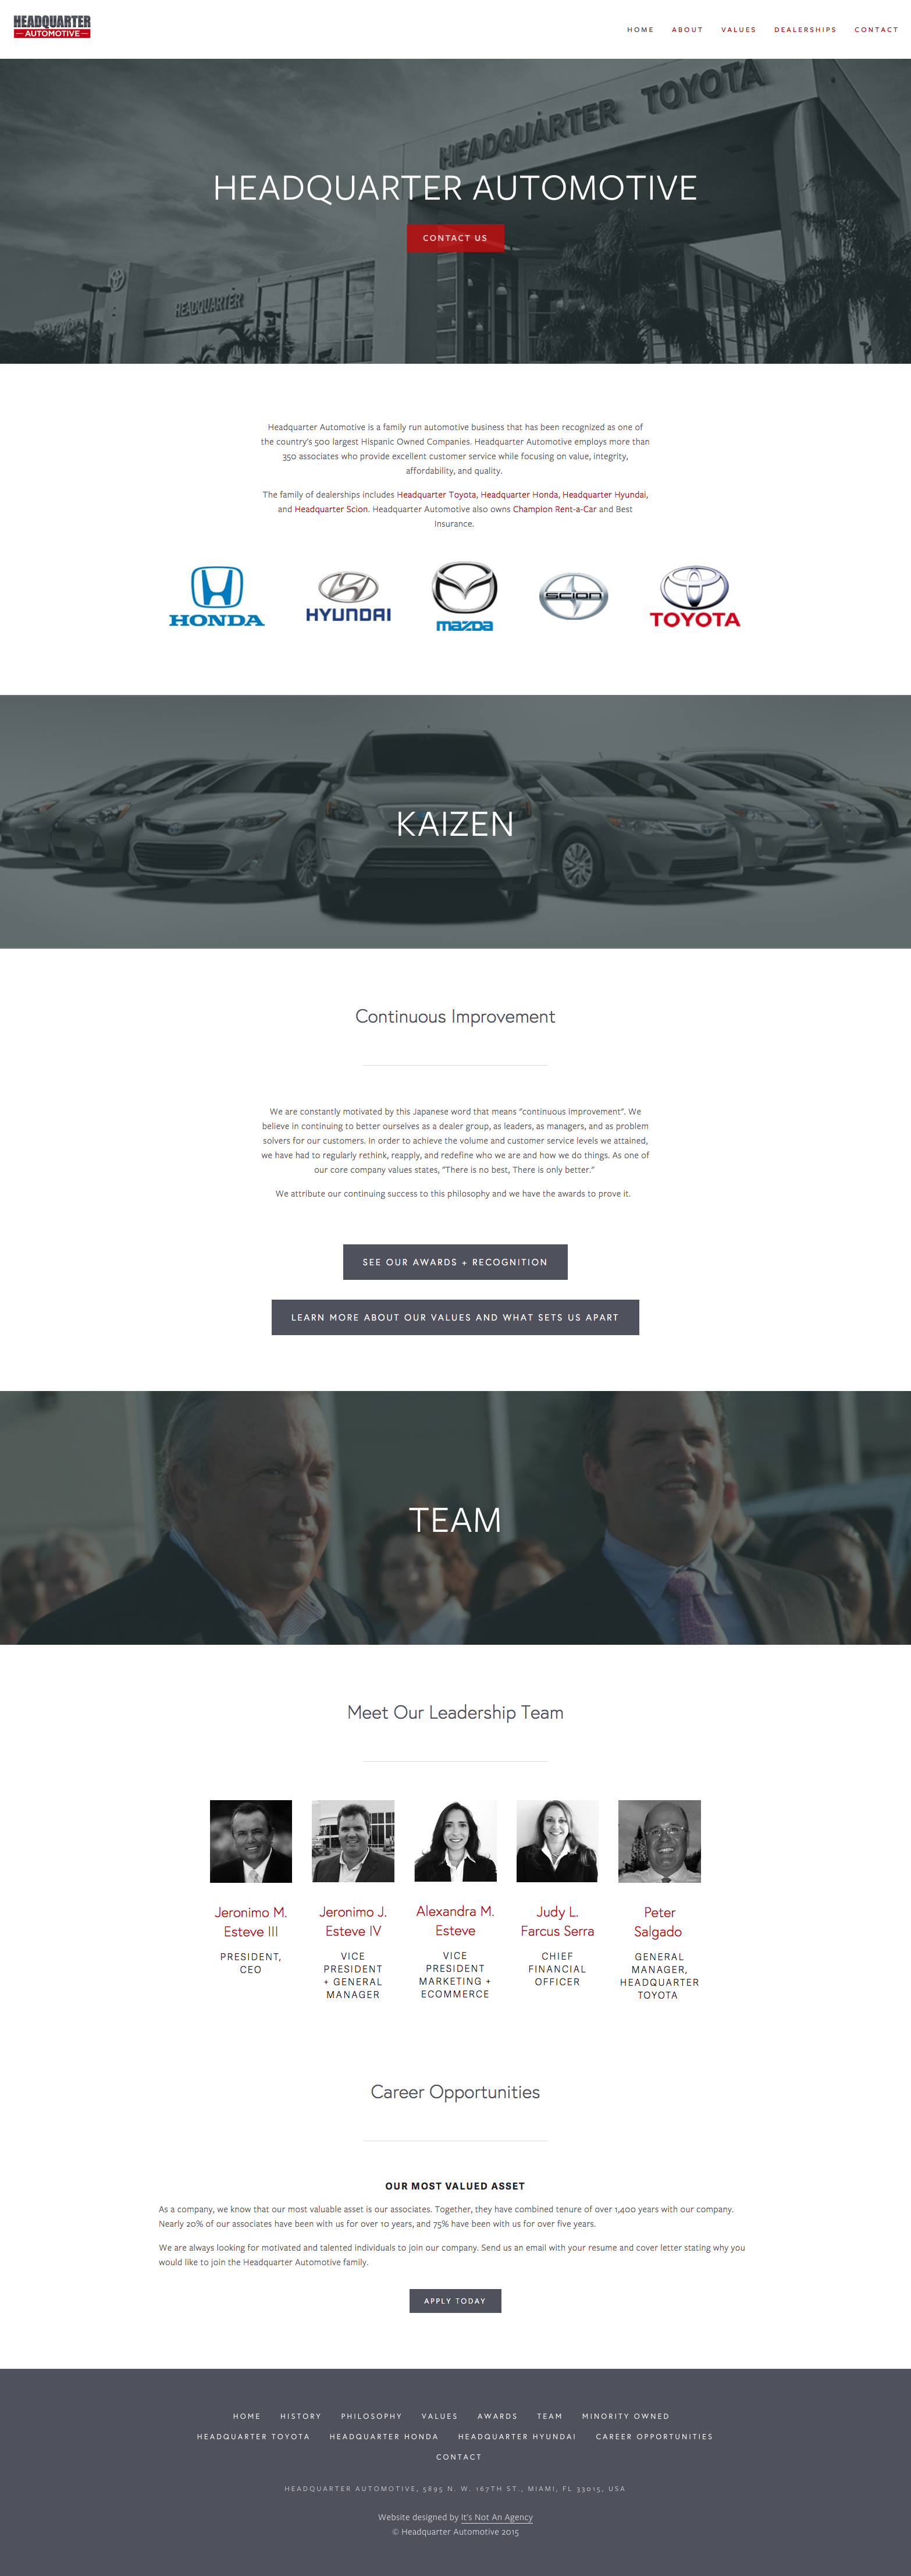 Automotive Website Design_Headquarter Automotive1.png